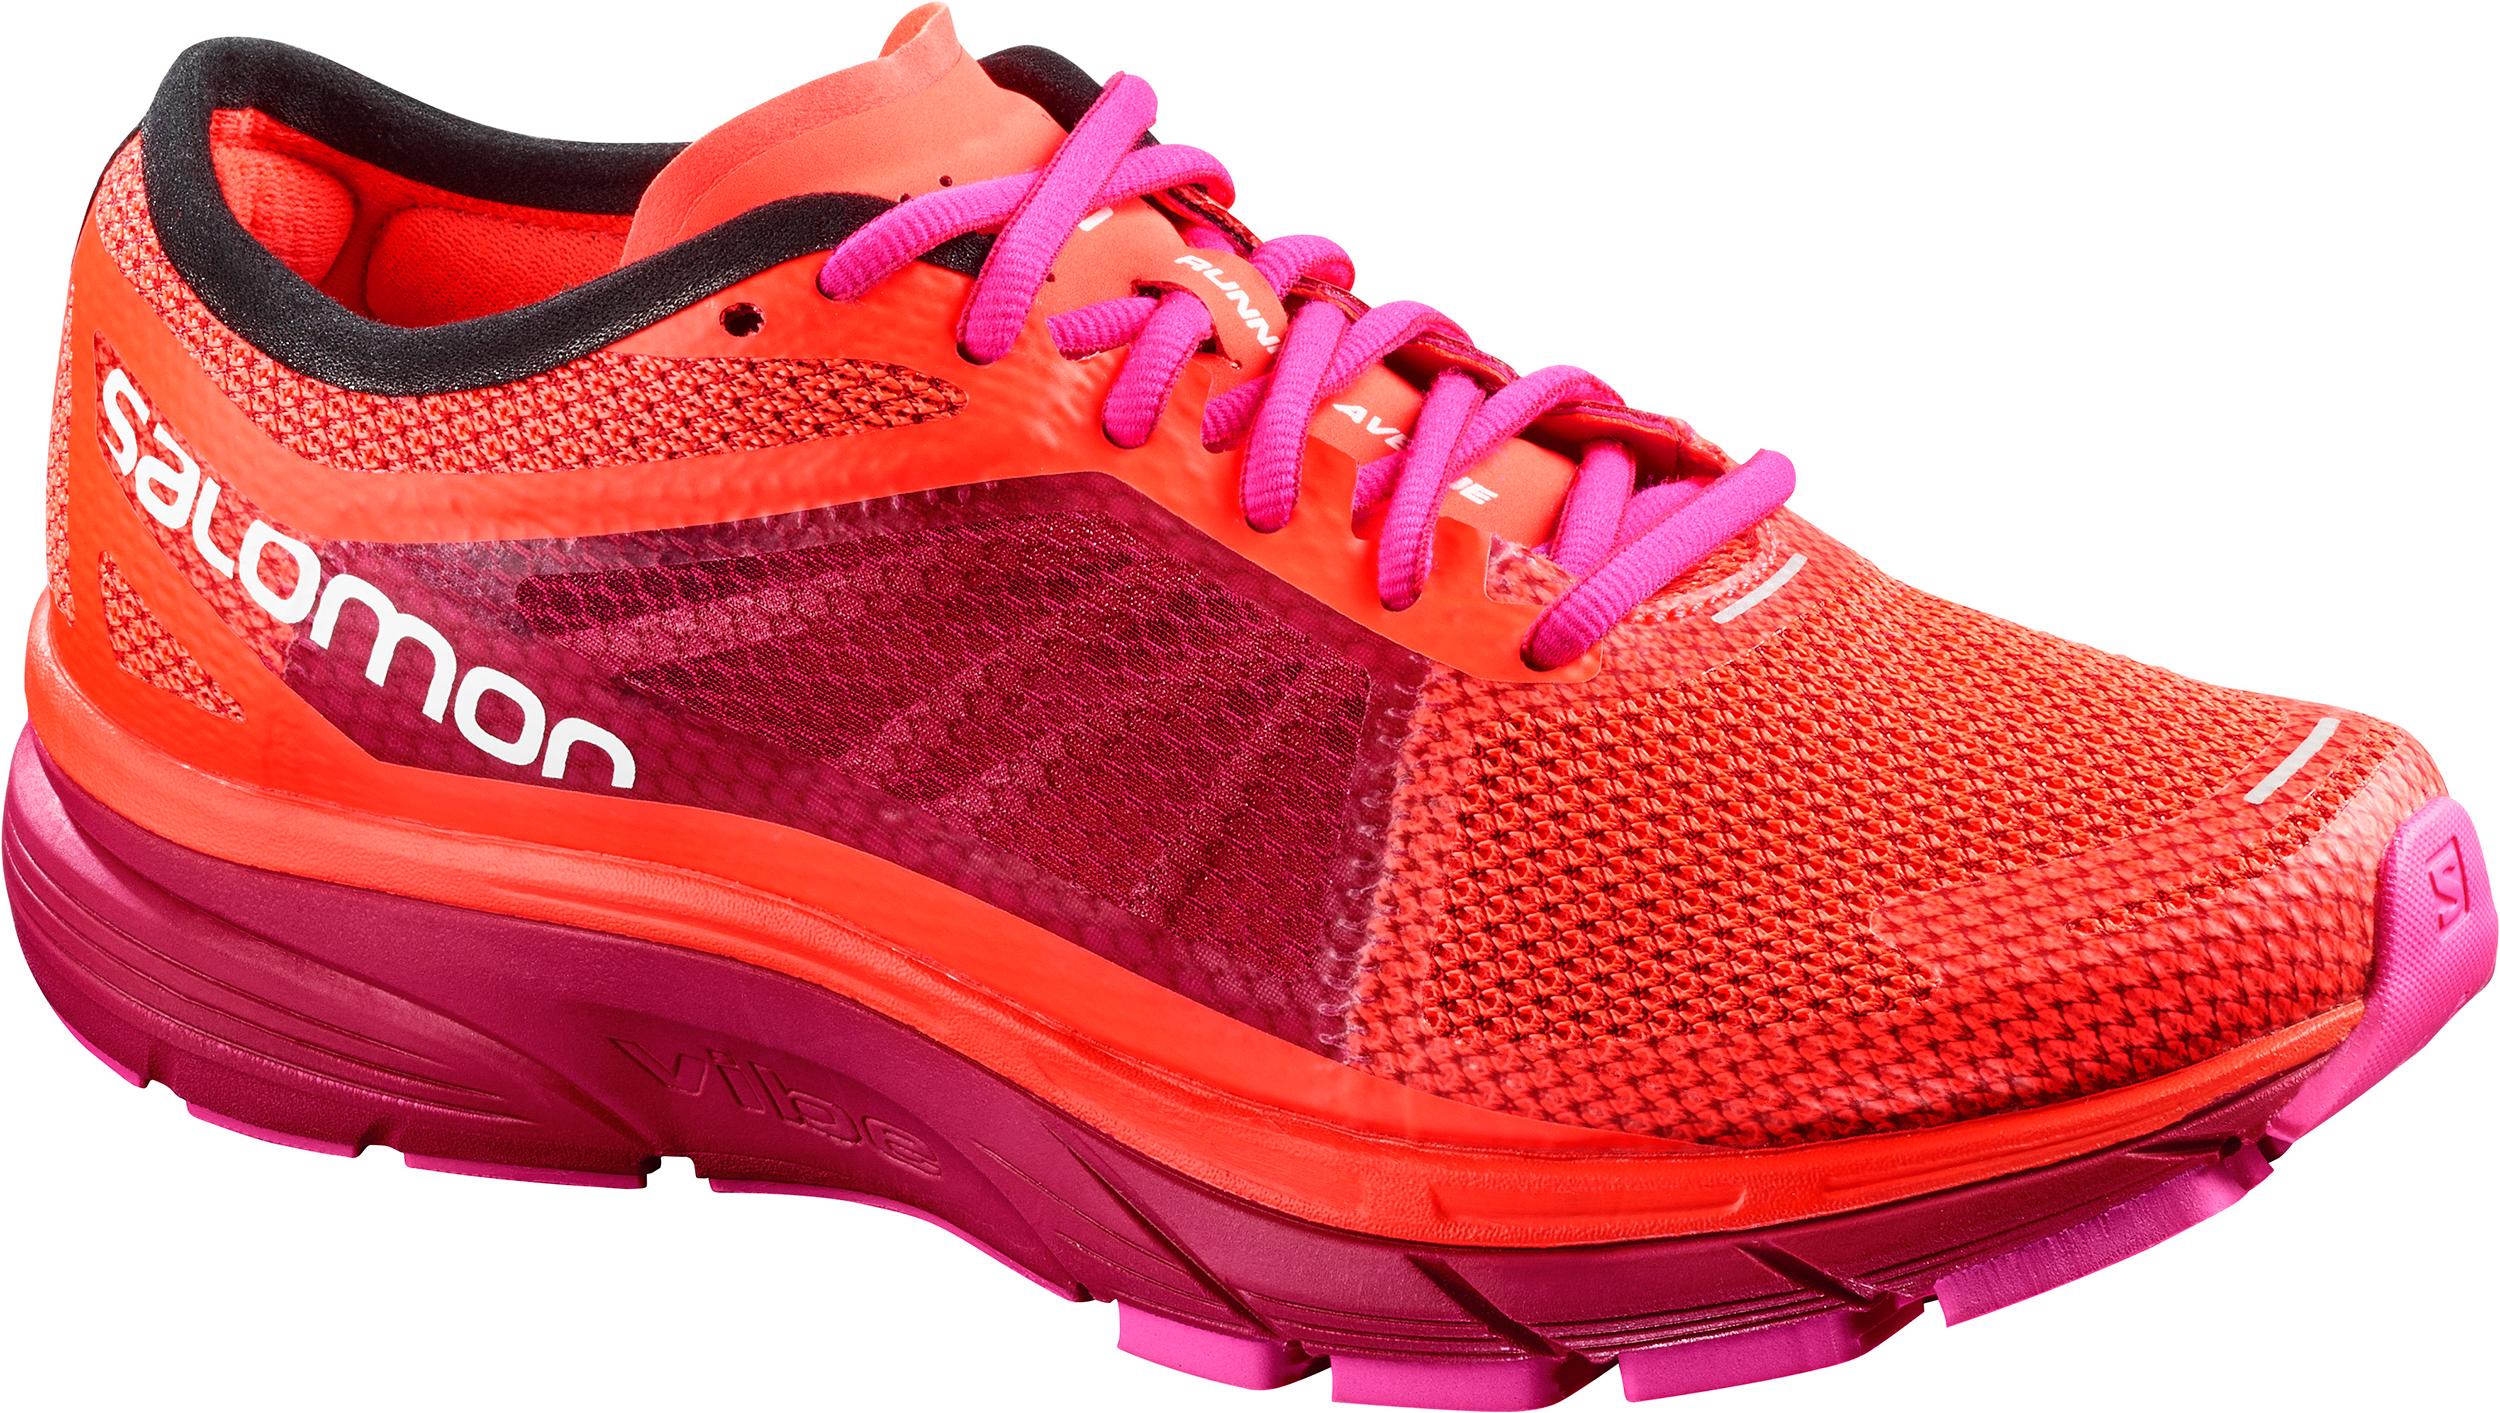 df021cf65086 Salomon Sonic RA Road Running Shoes - Women s